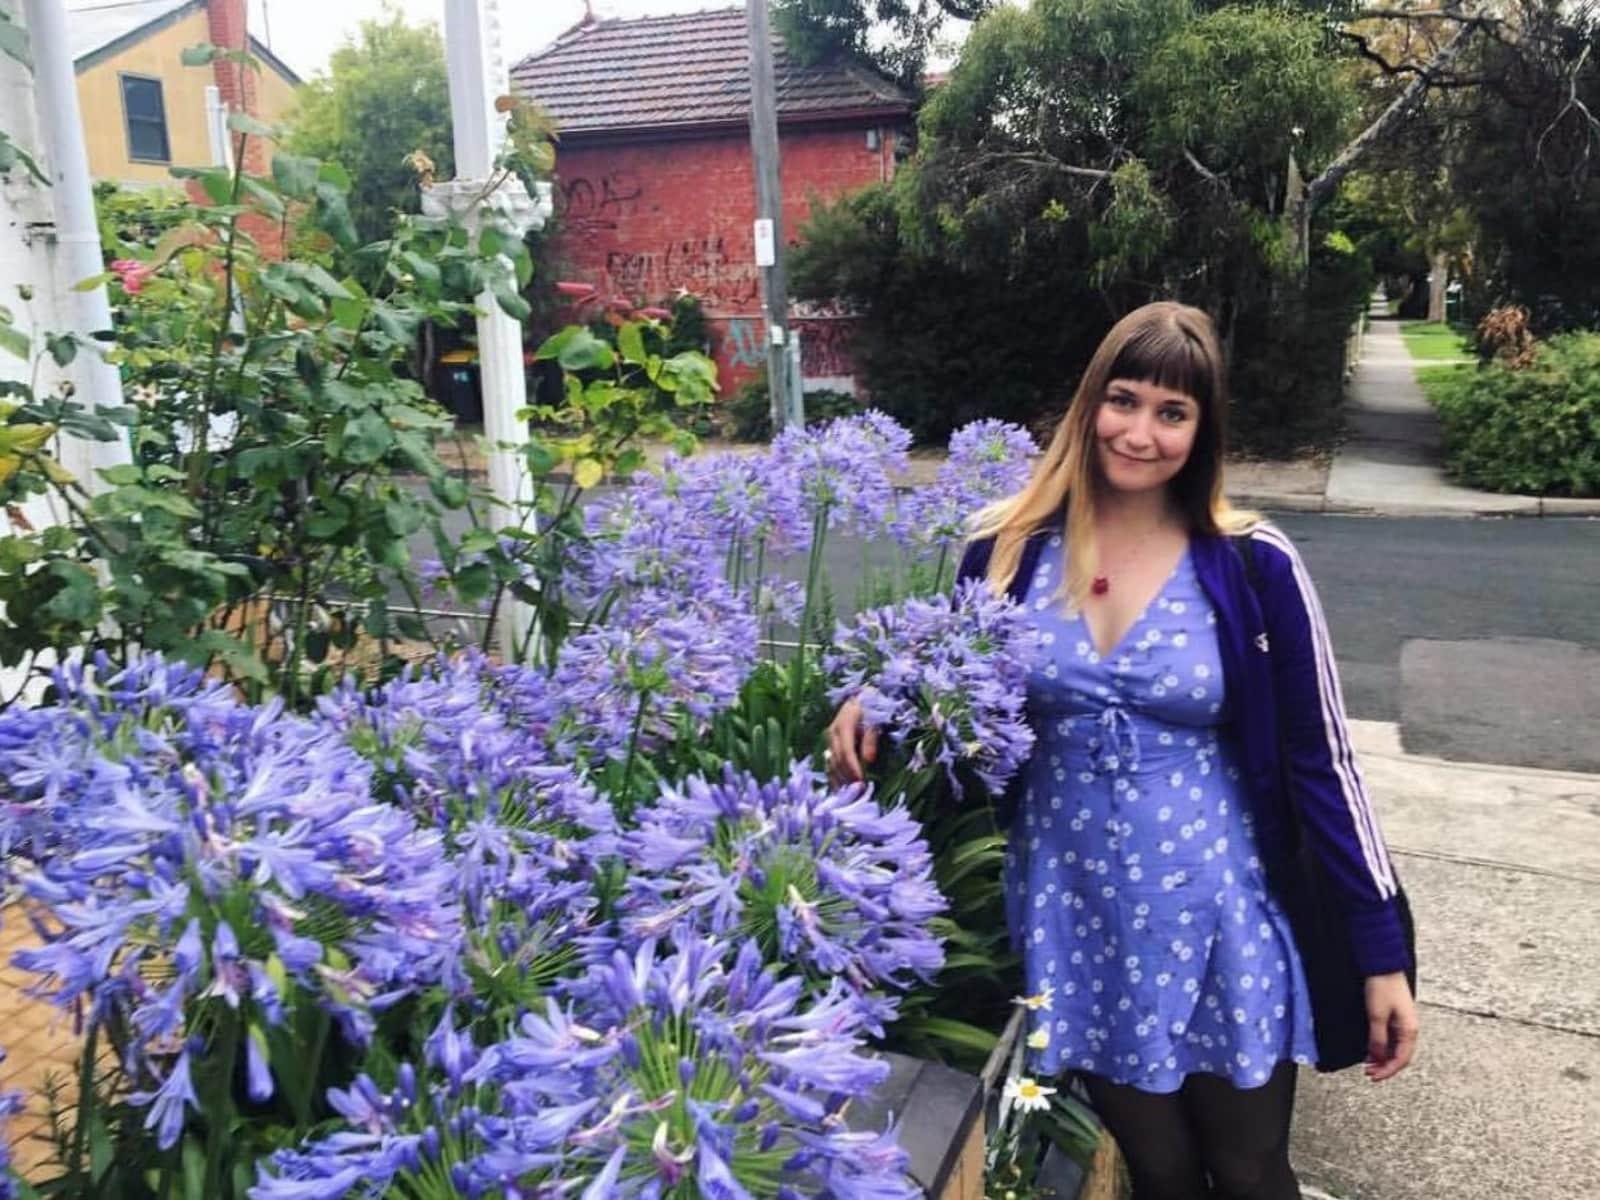 Sophia from London, United Kingdom